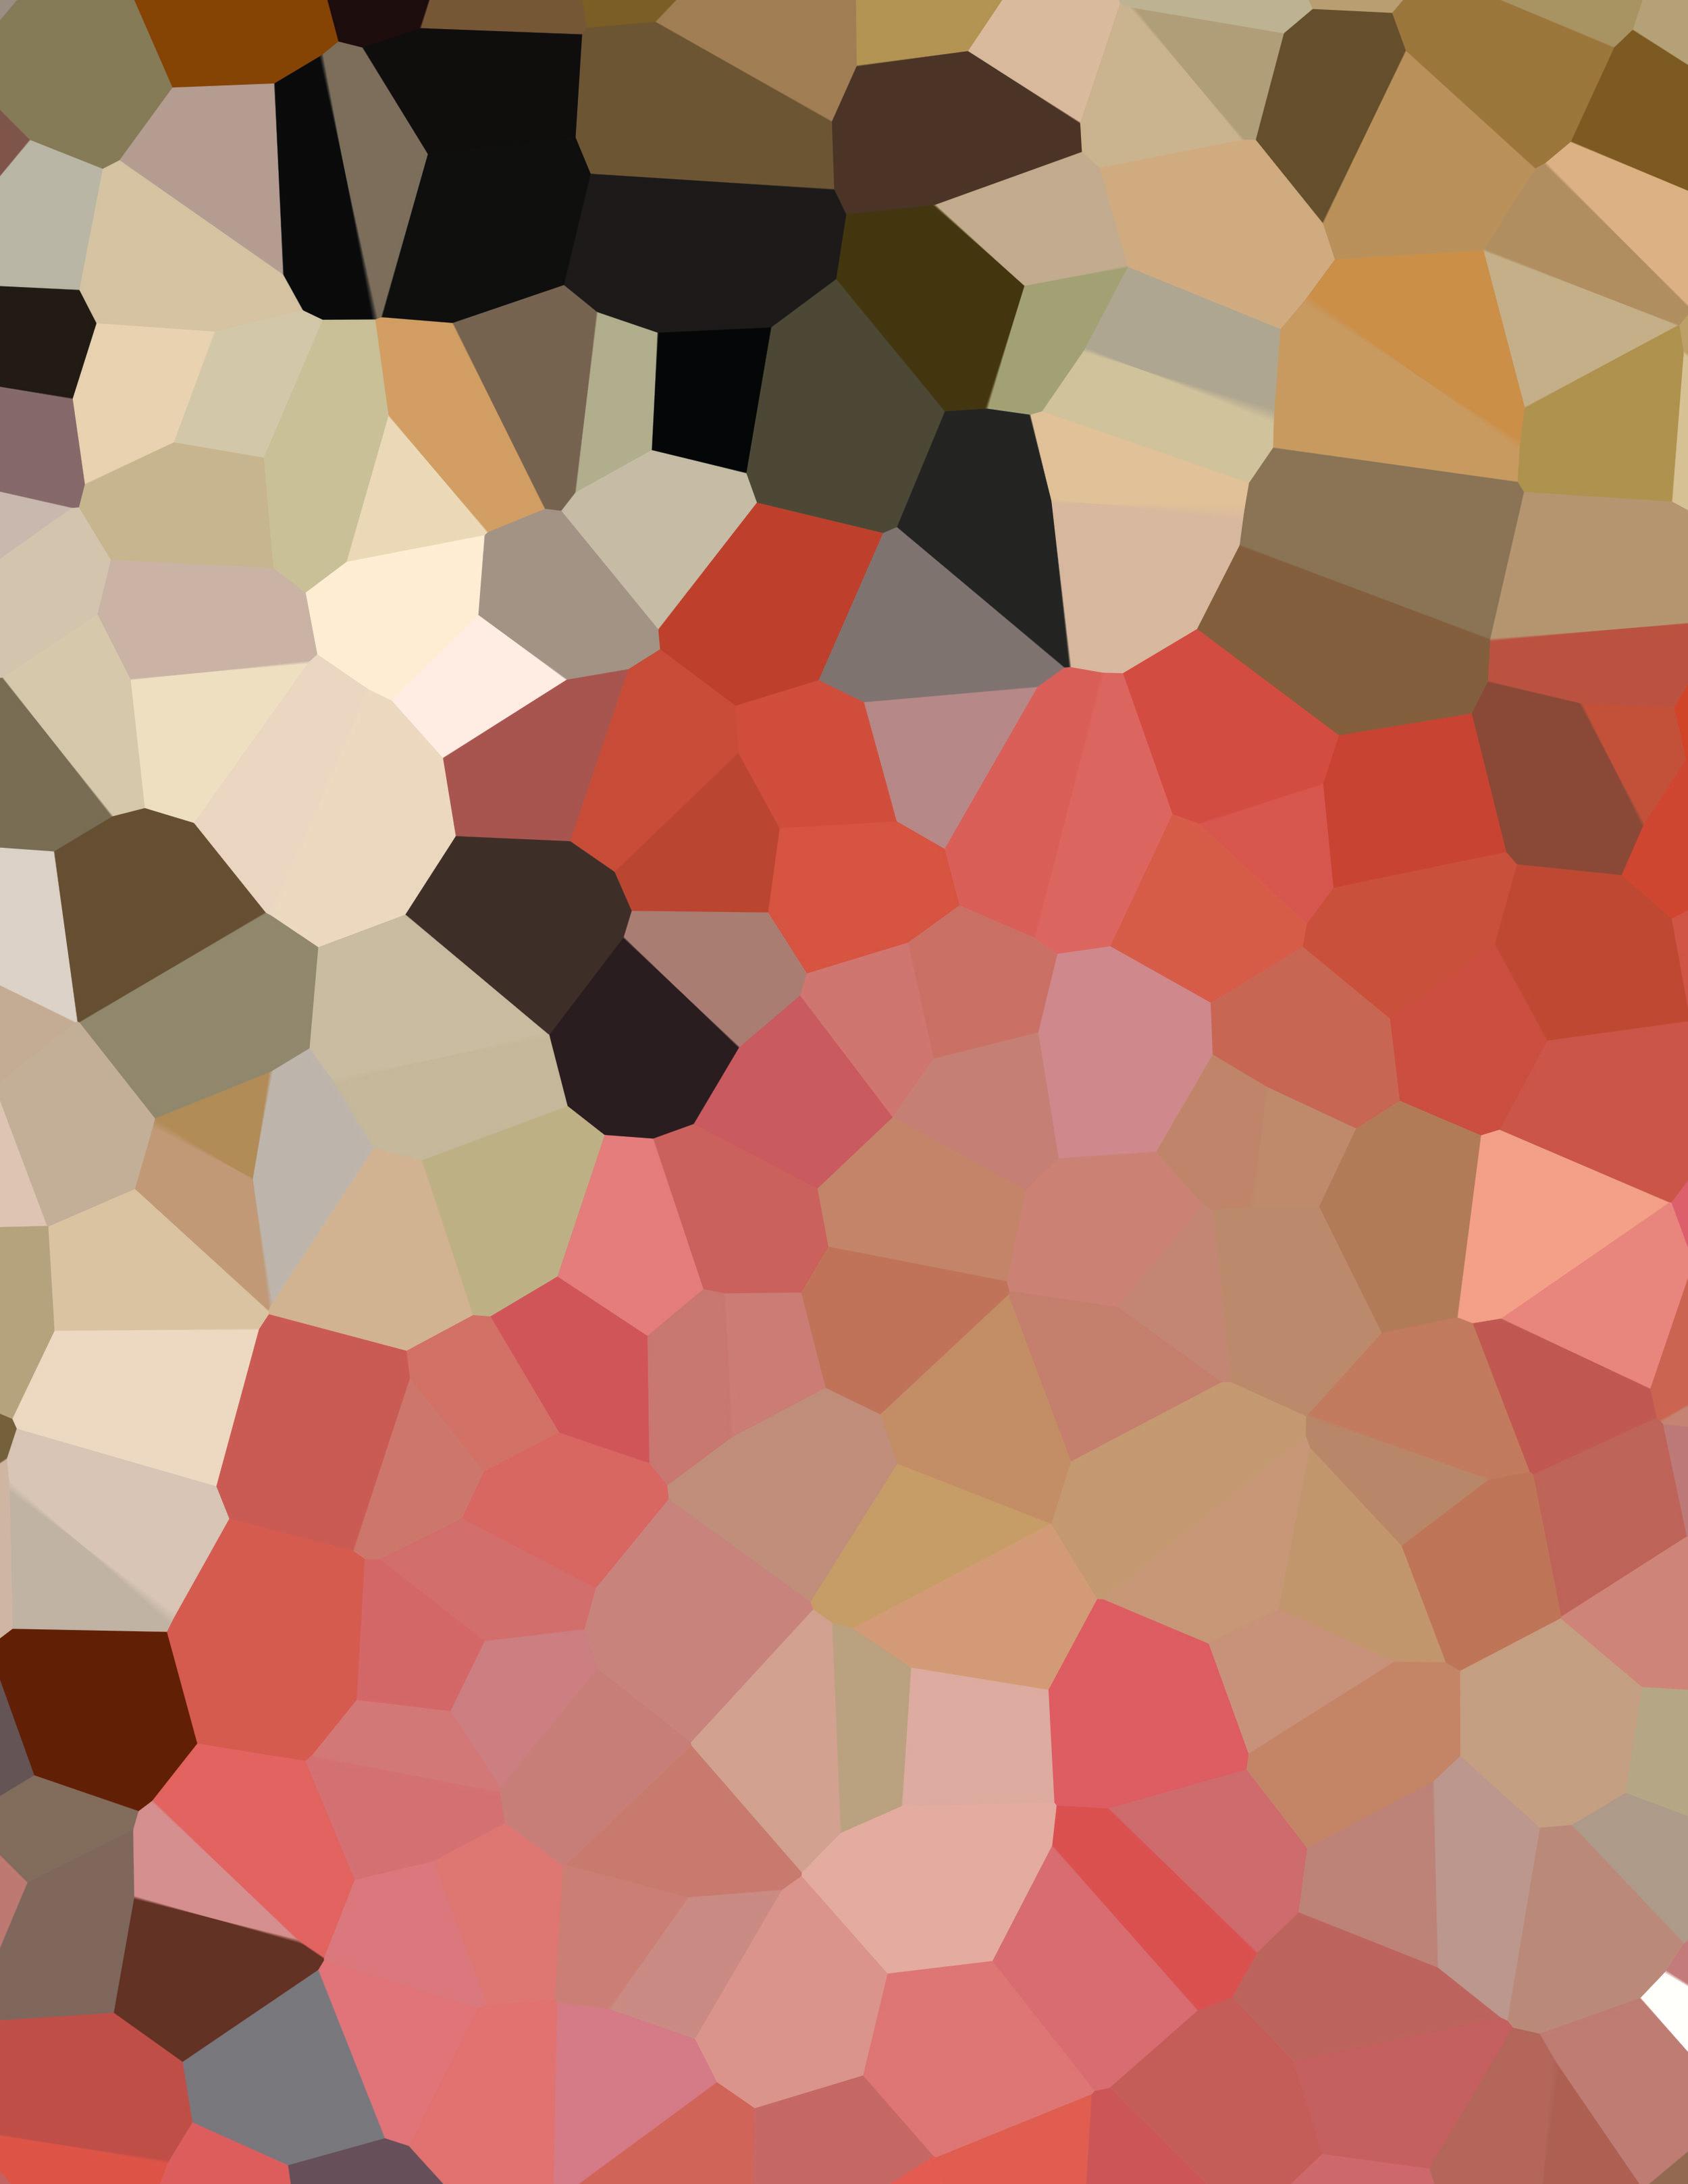 rock_3_mosaic.jpg